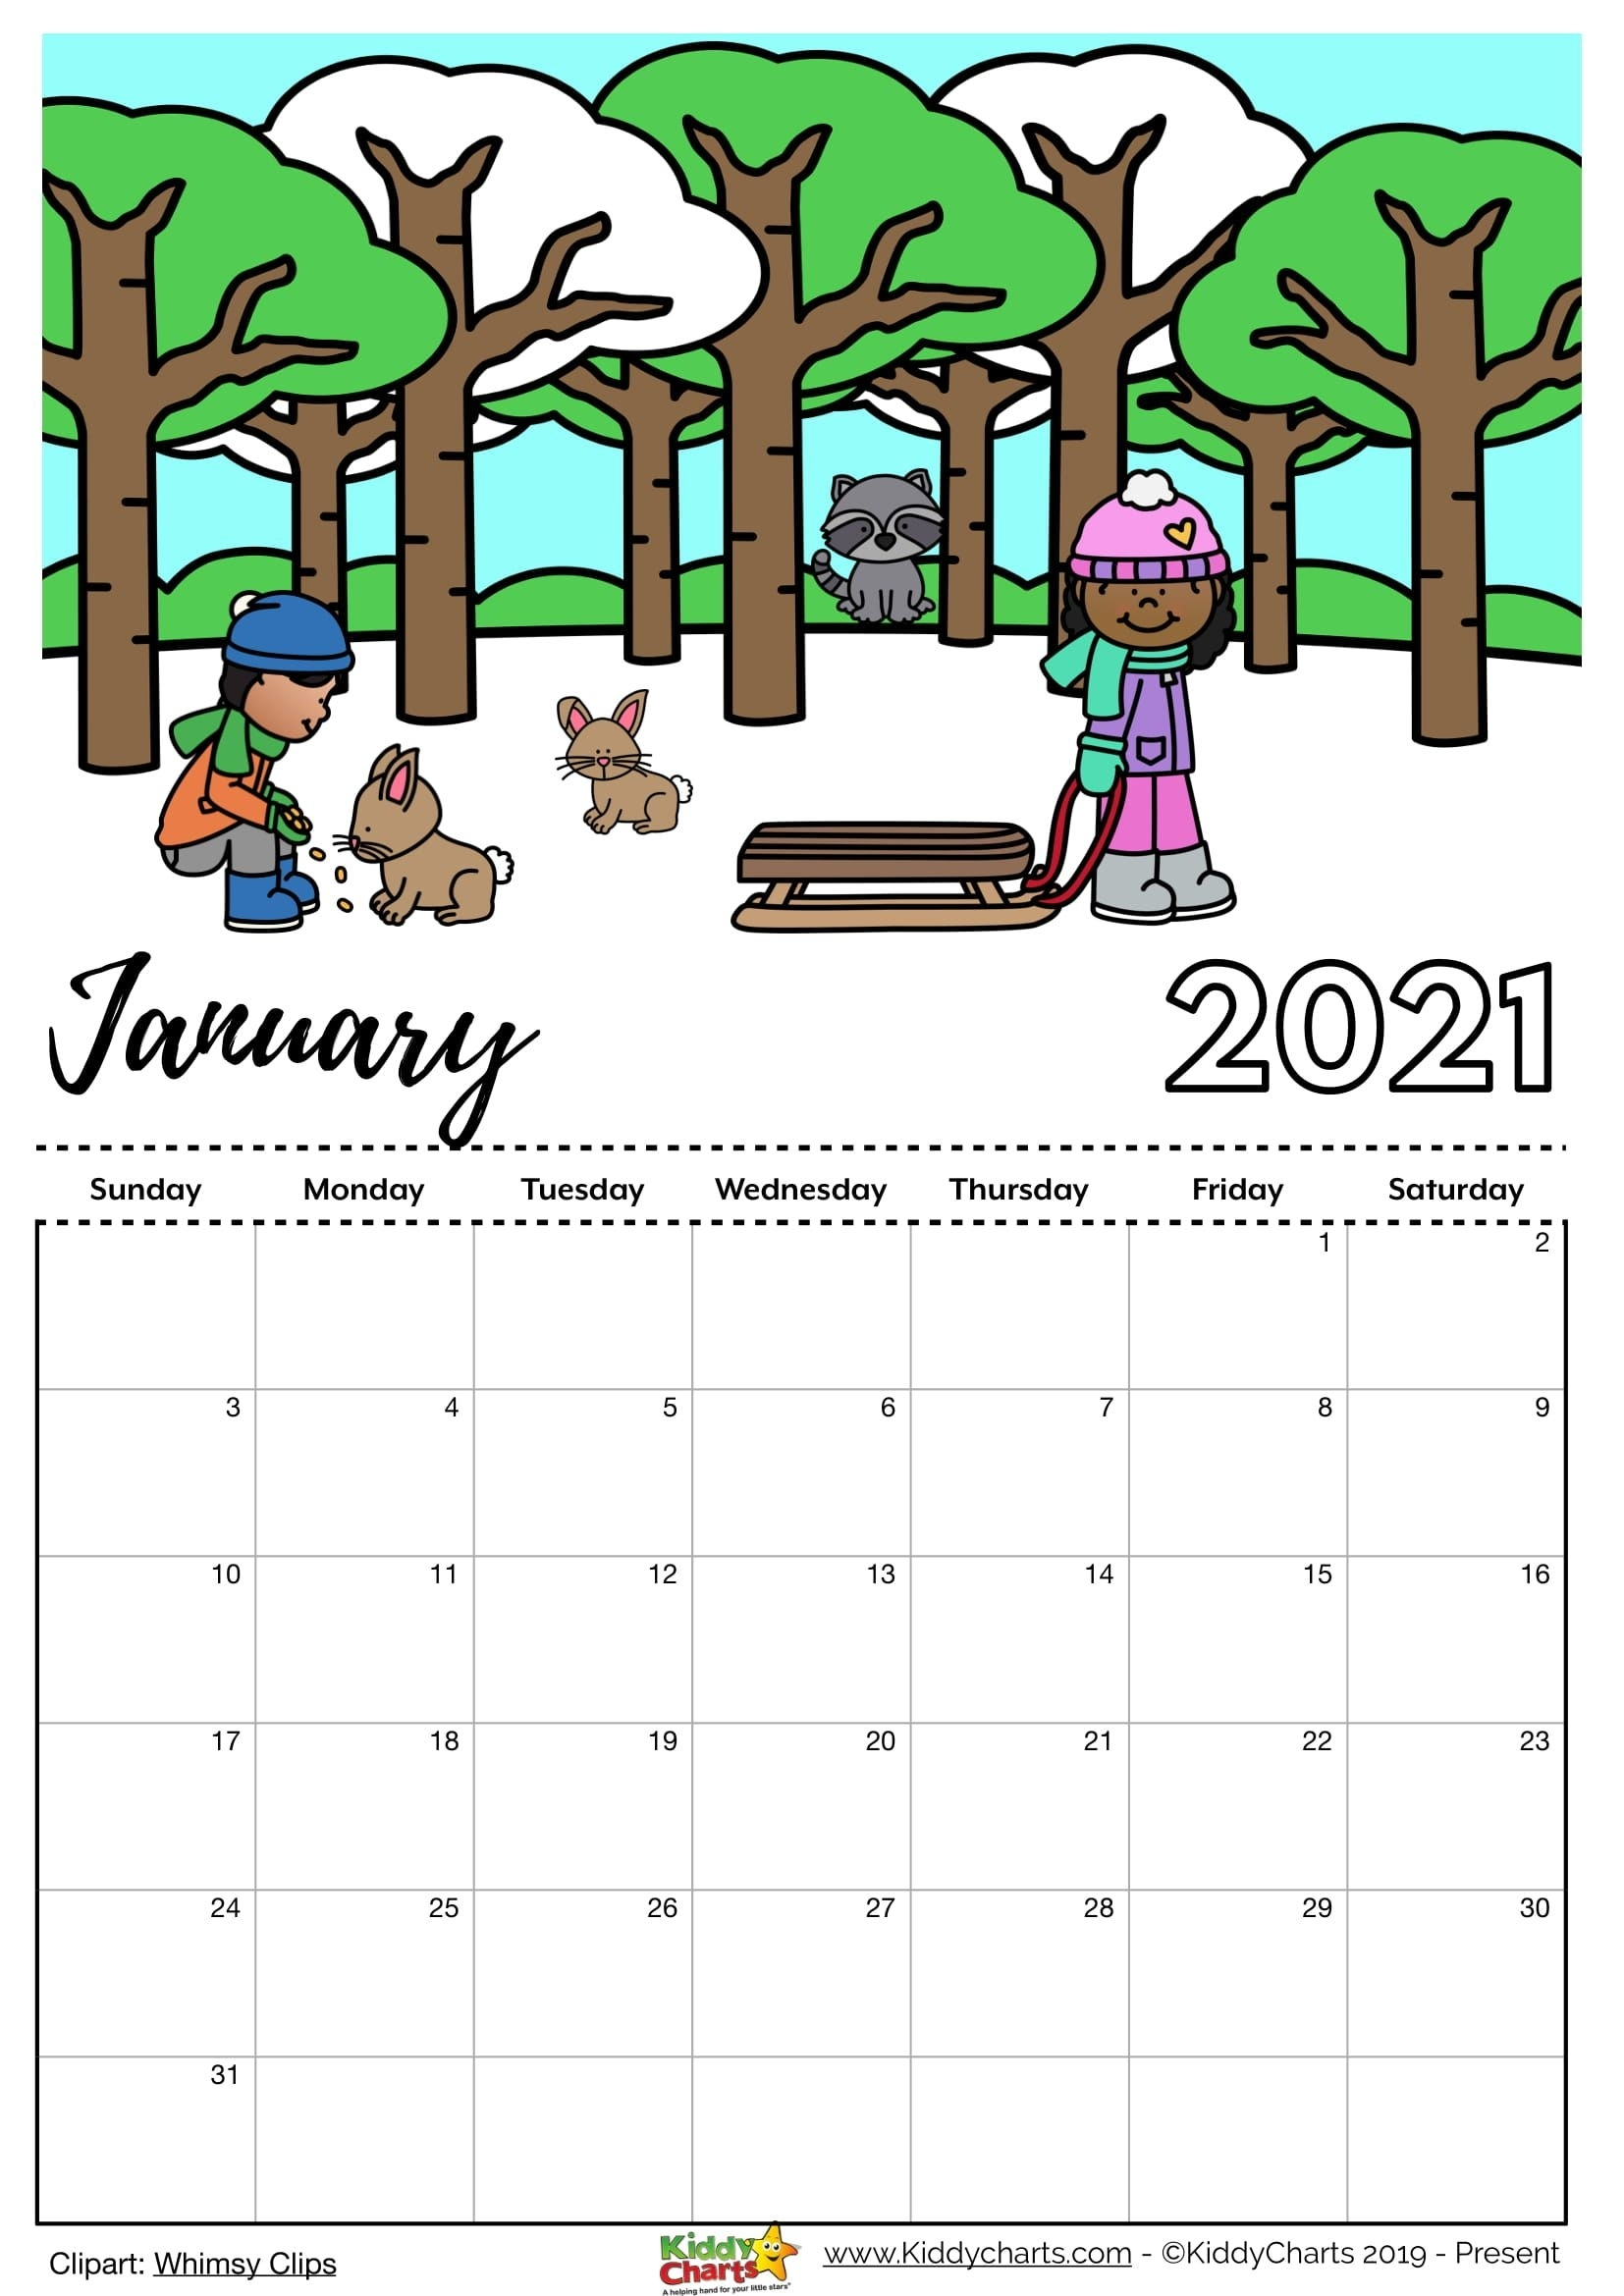 Catch Imom 2021 Gingerbread Calendar